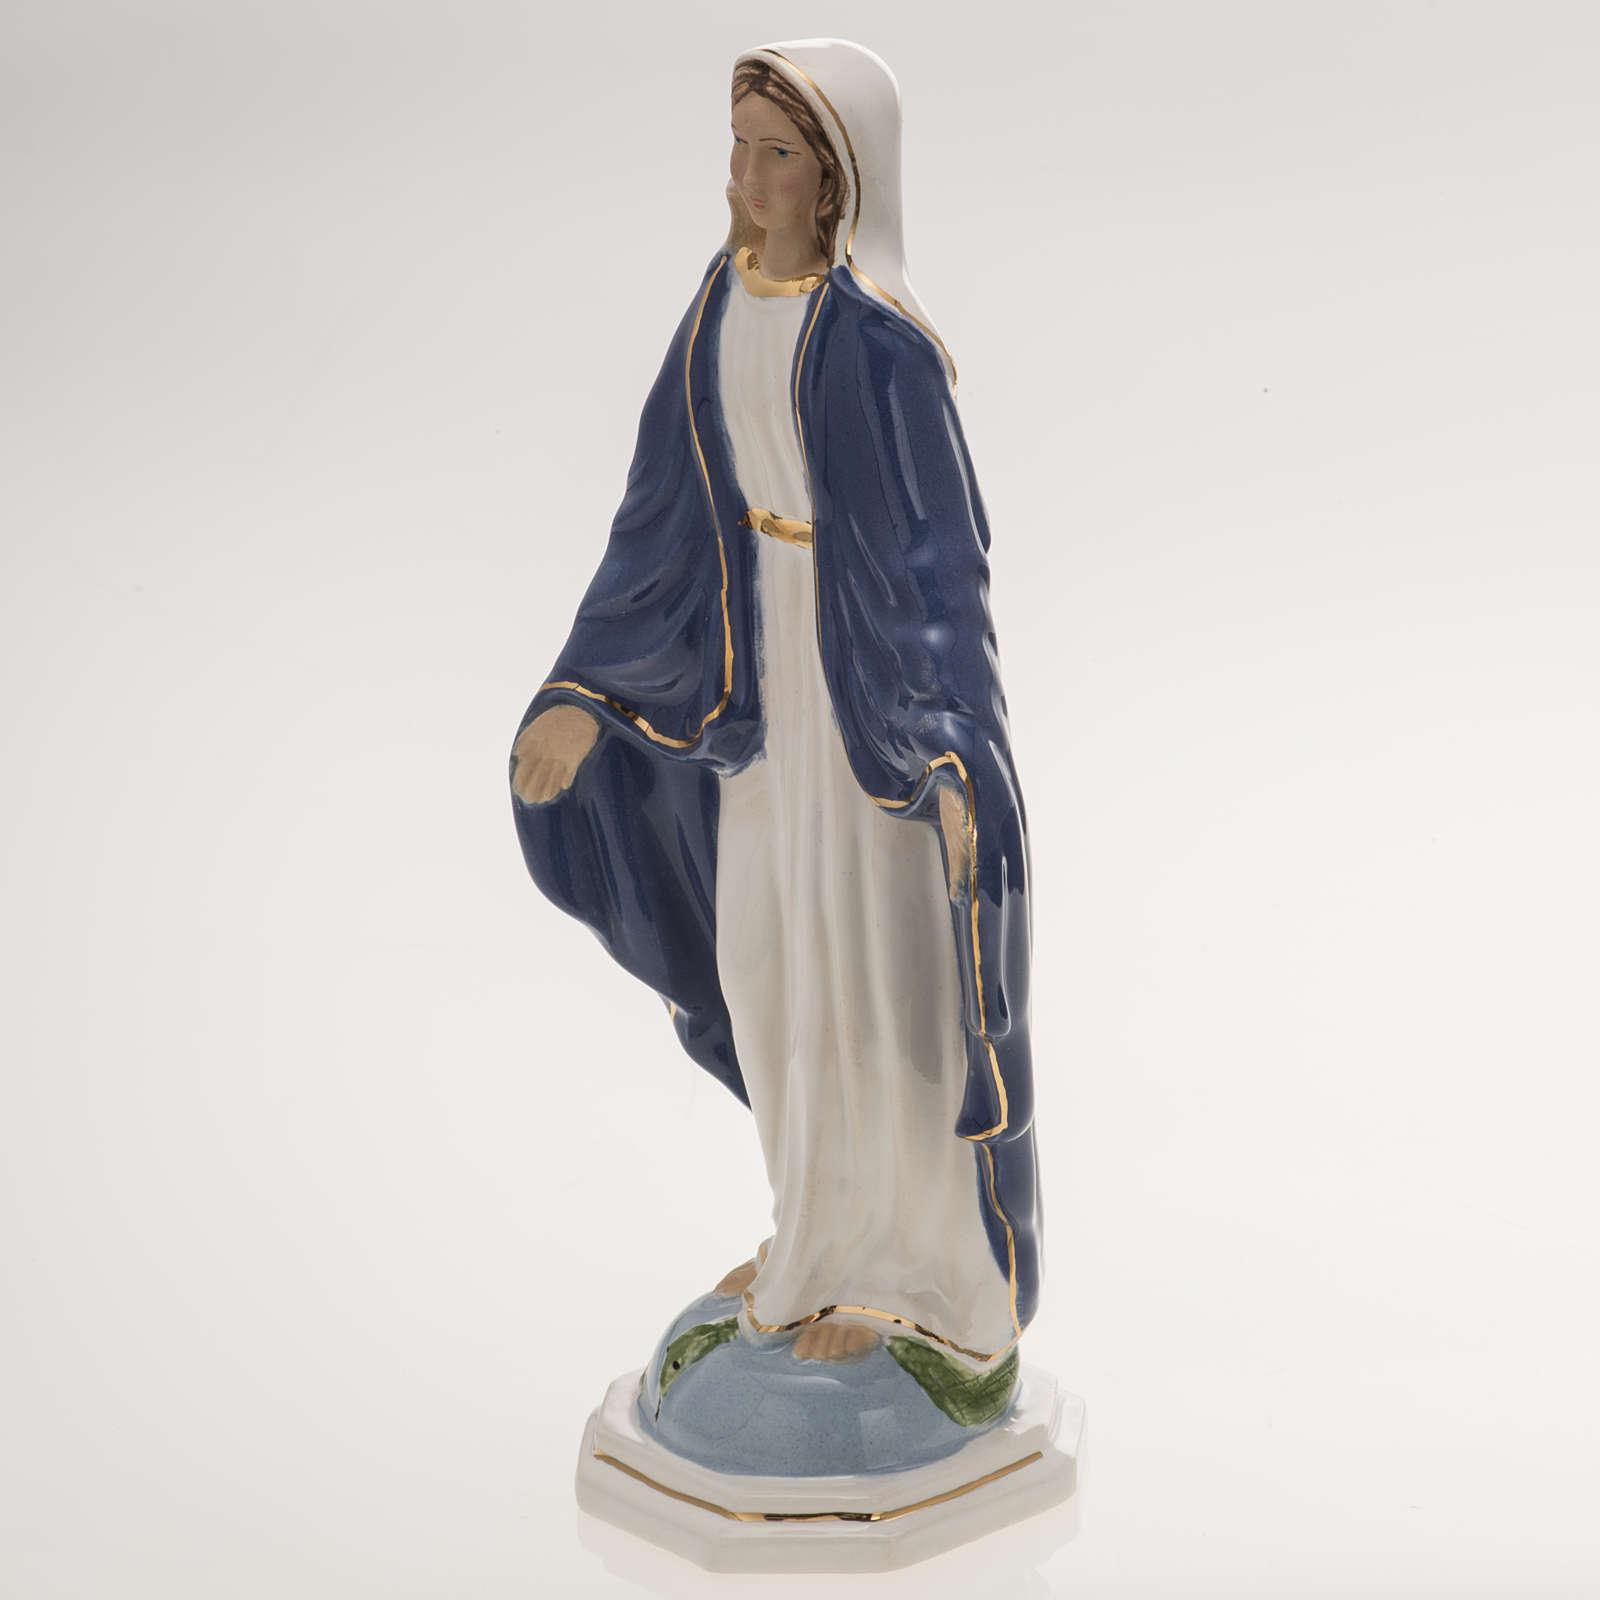 Statue Vierge Miraculeuse 18,5 cm céramique 4